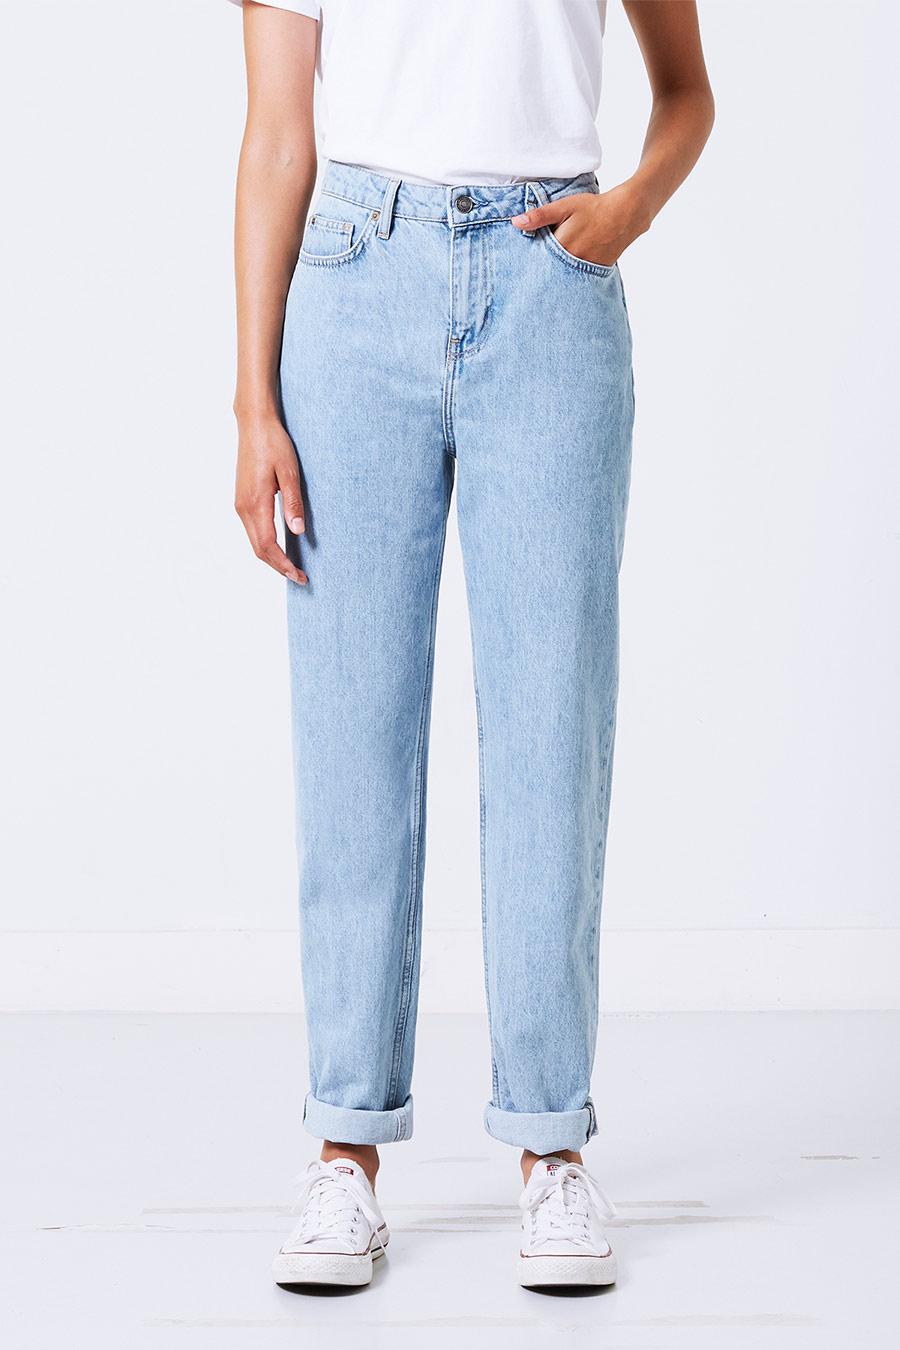 Jadan Jeans